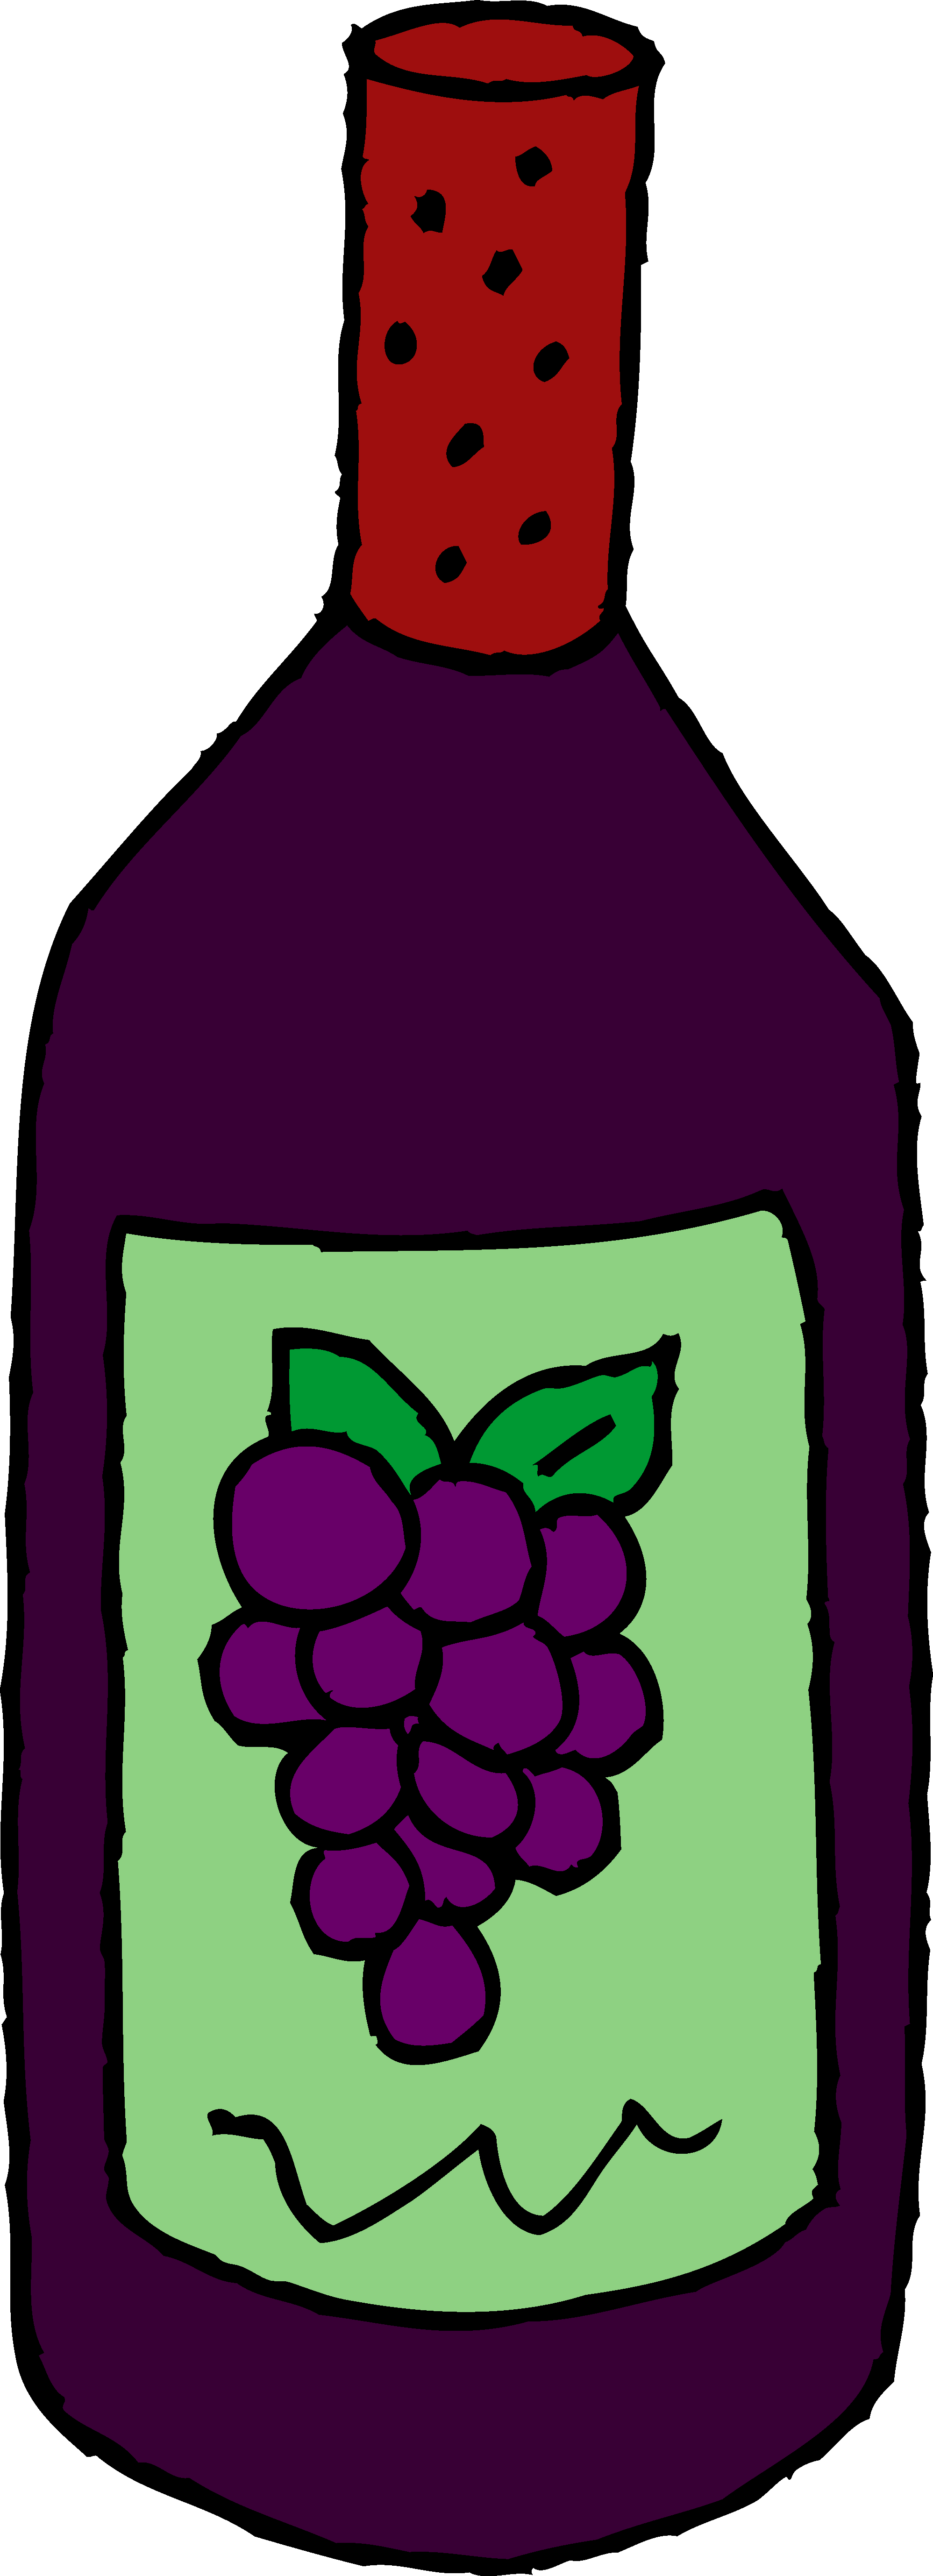 Wine clip art free. Grape clipart printable